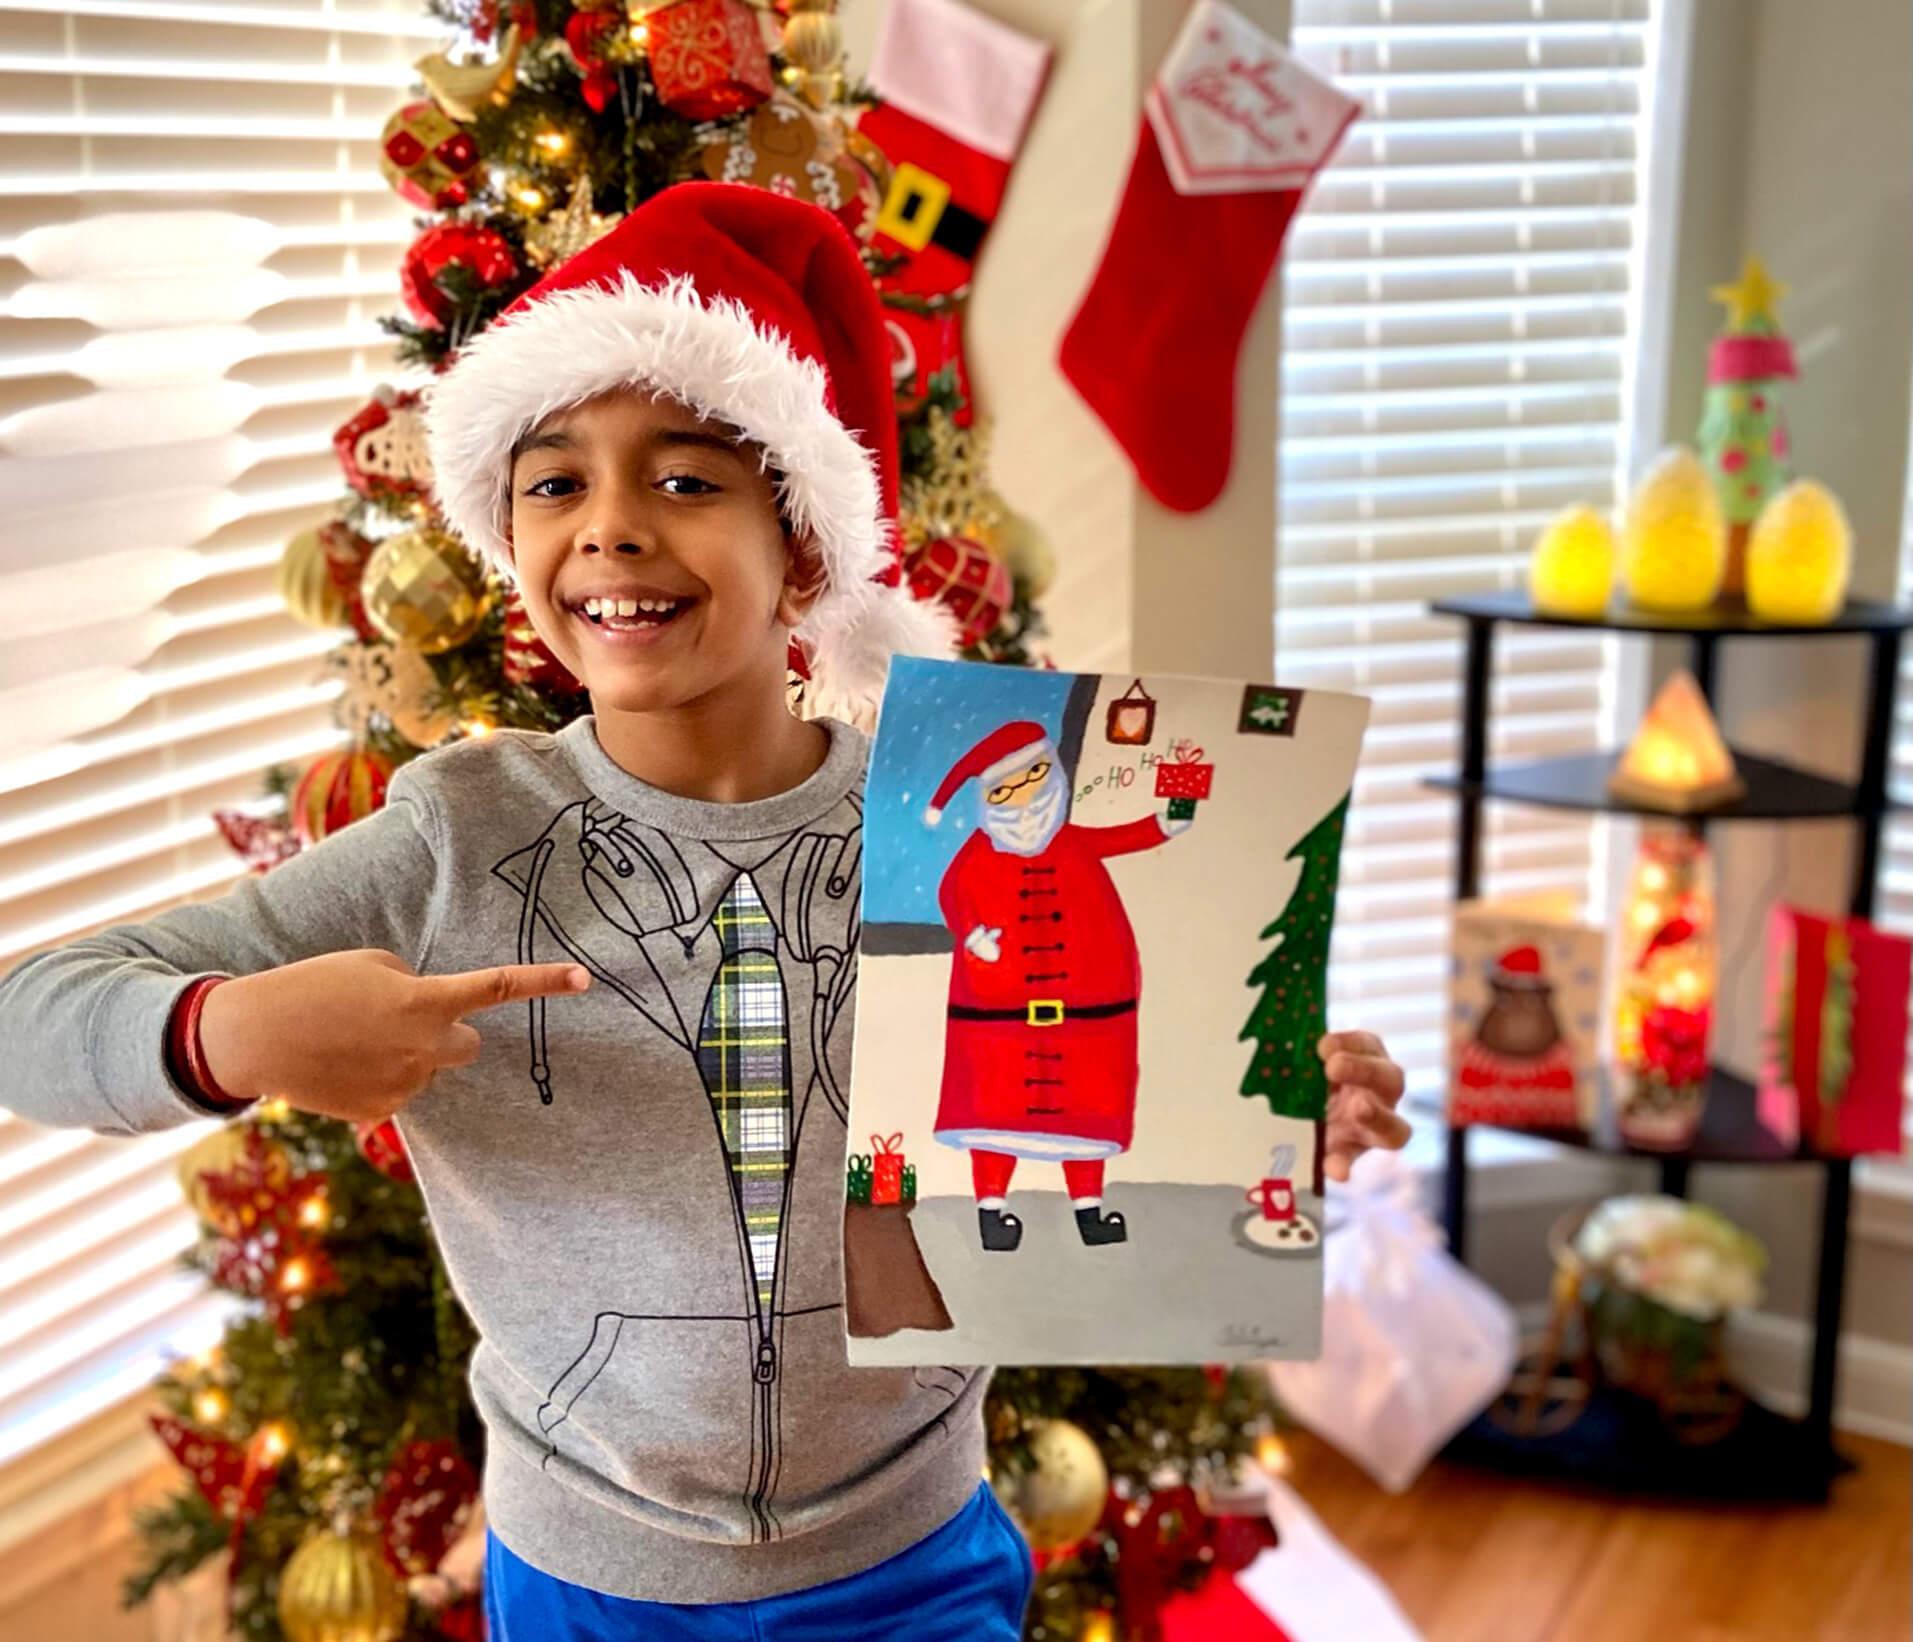 Santa Claus on canvas - acrylic painting by Aditya Chanda in Nimmy's Art Online Art Christmas Art Camp in Katy, Texas